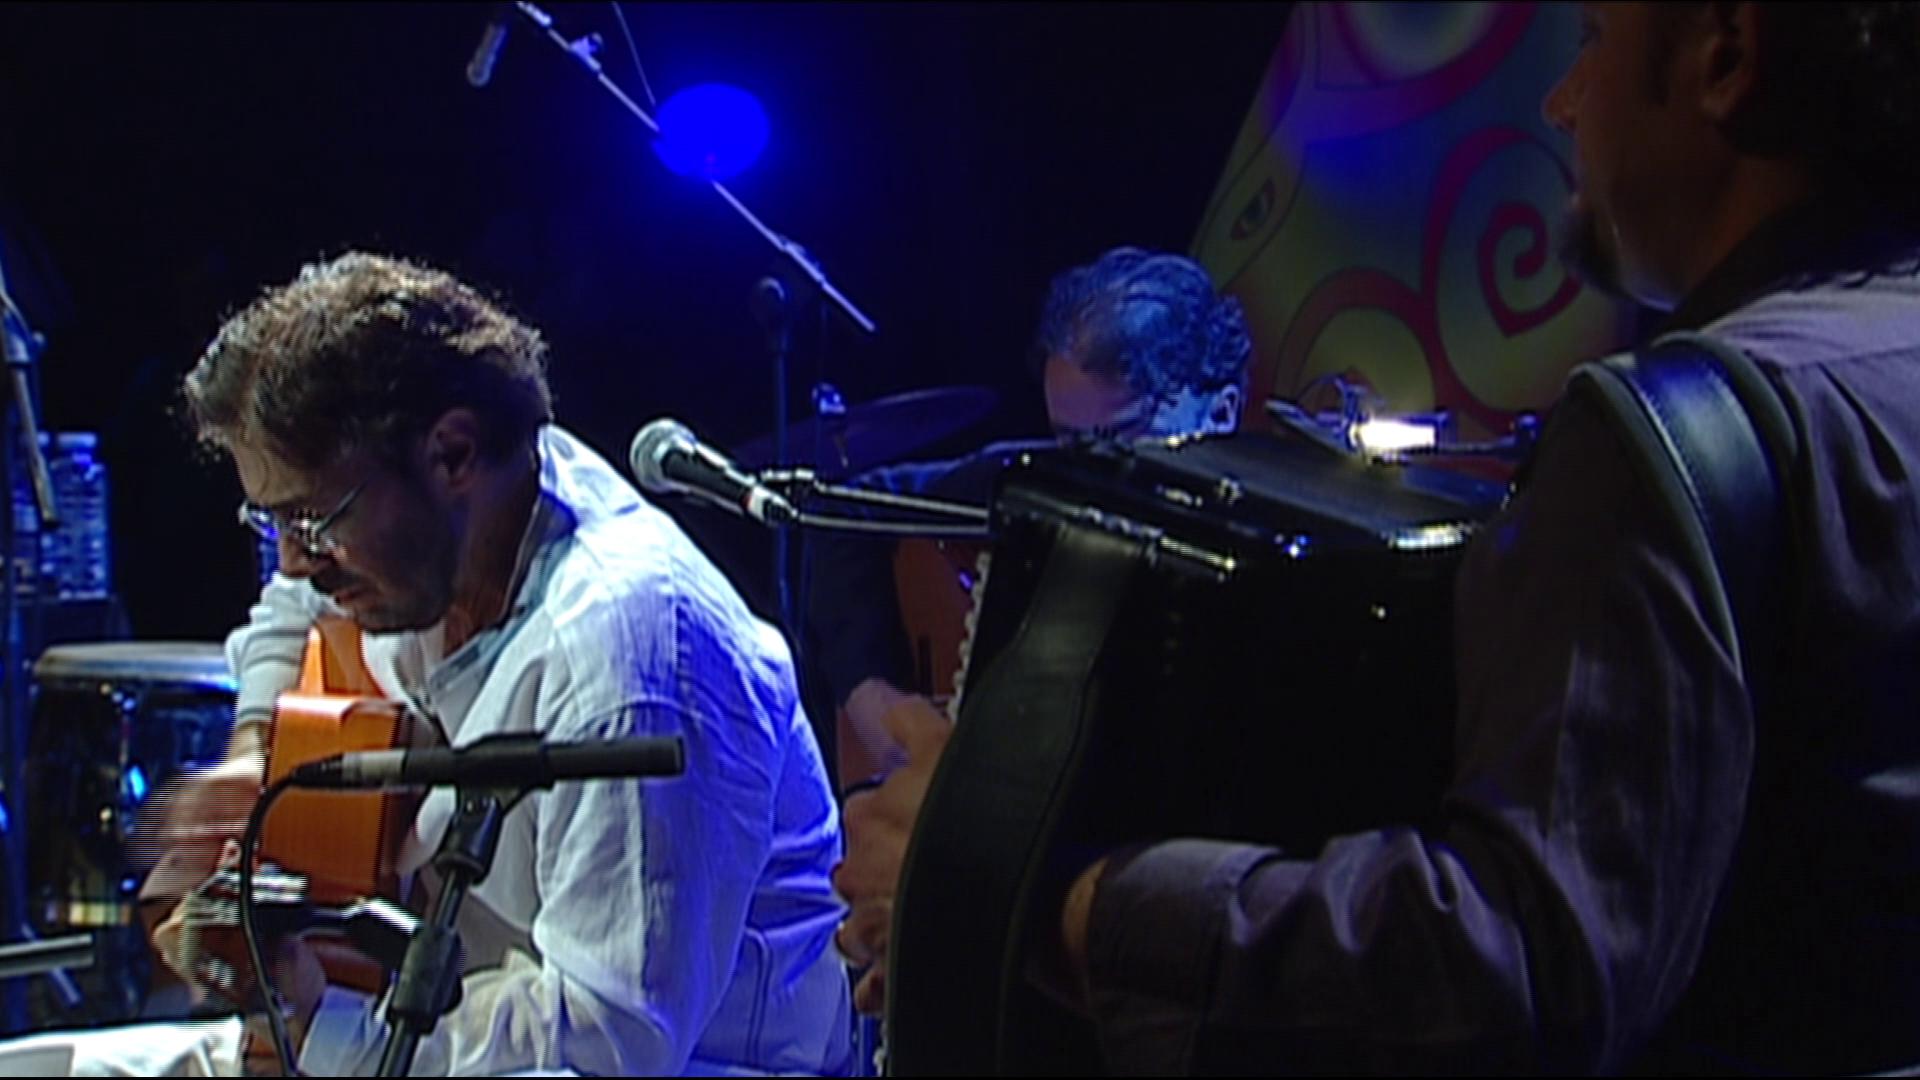 2009 Al Di Meola - Morocco Fantasia - World Sinfonia Live (2012) [Blu-ray] 4